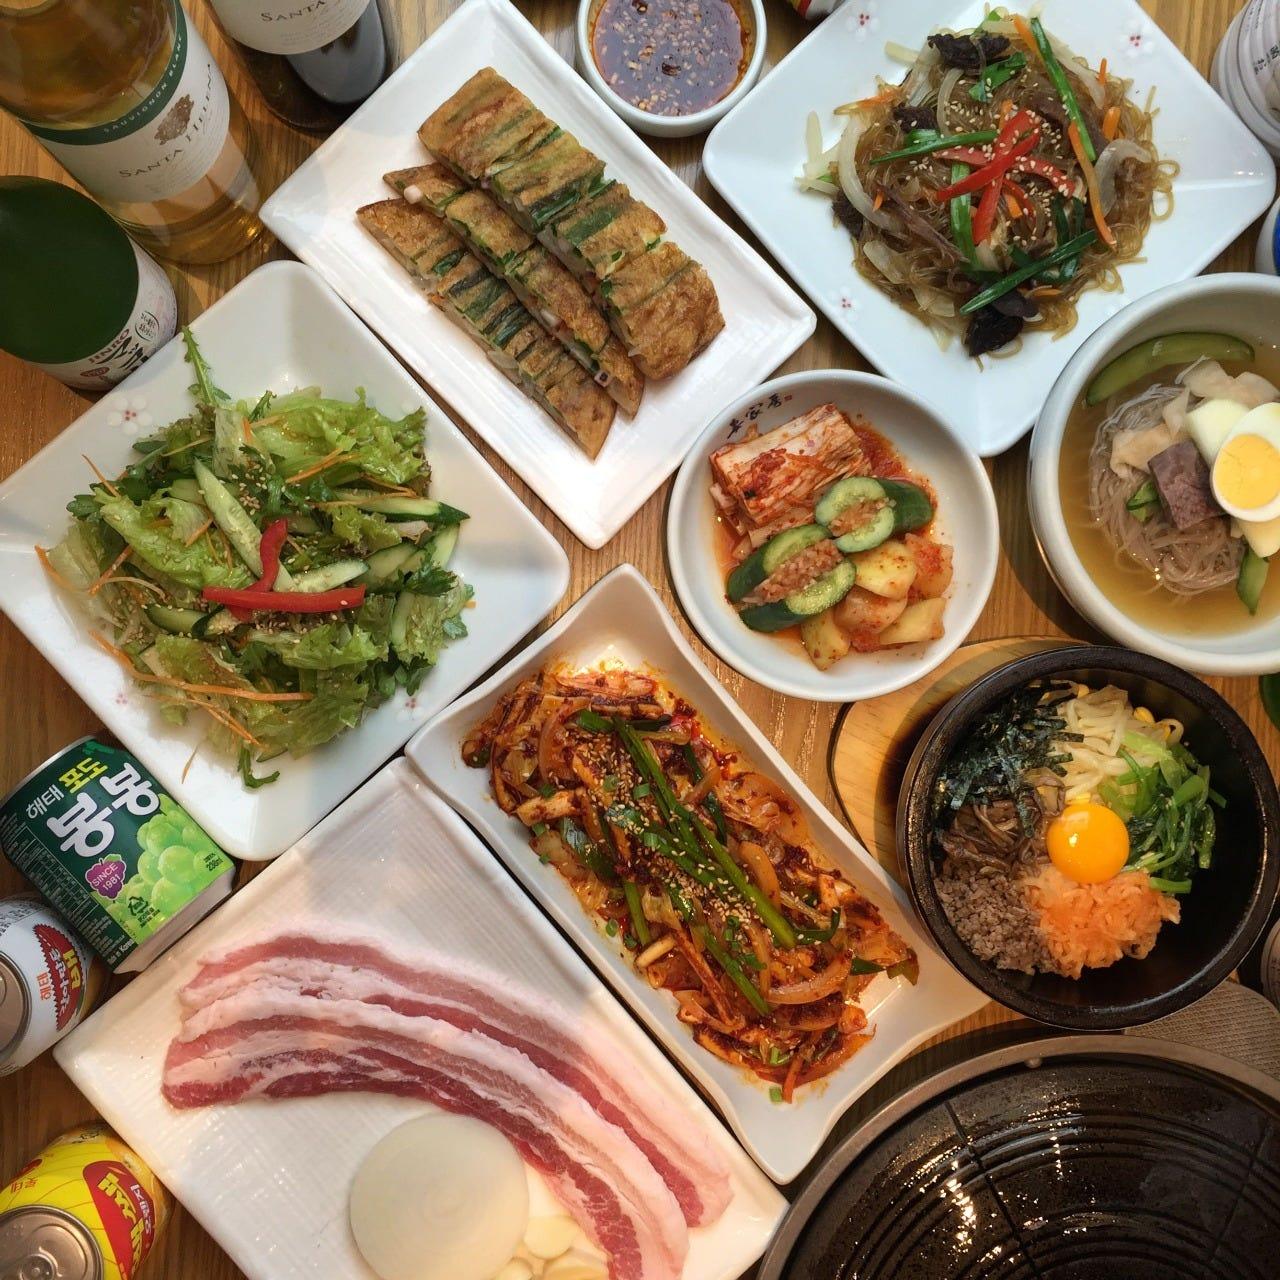 韓国旬彩料理 妻家房 有楽町イトシア店